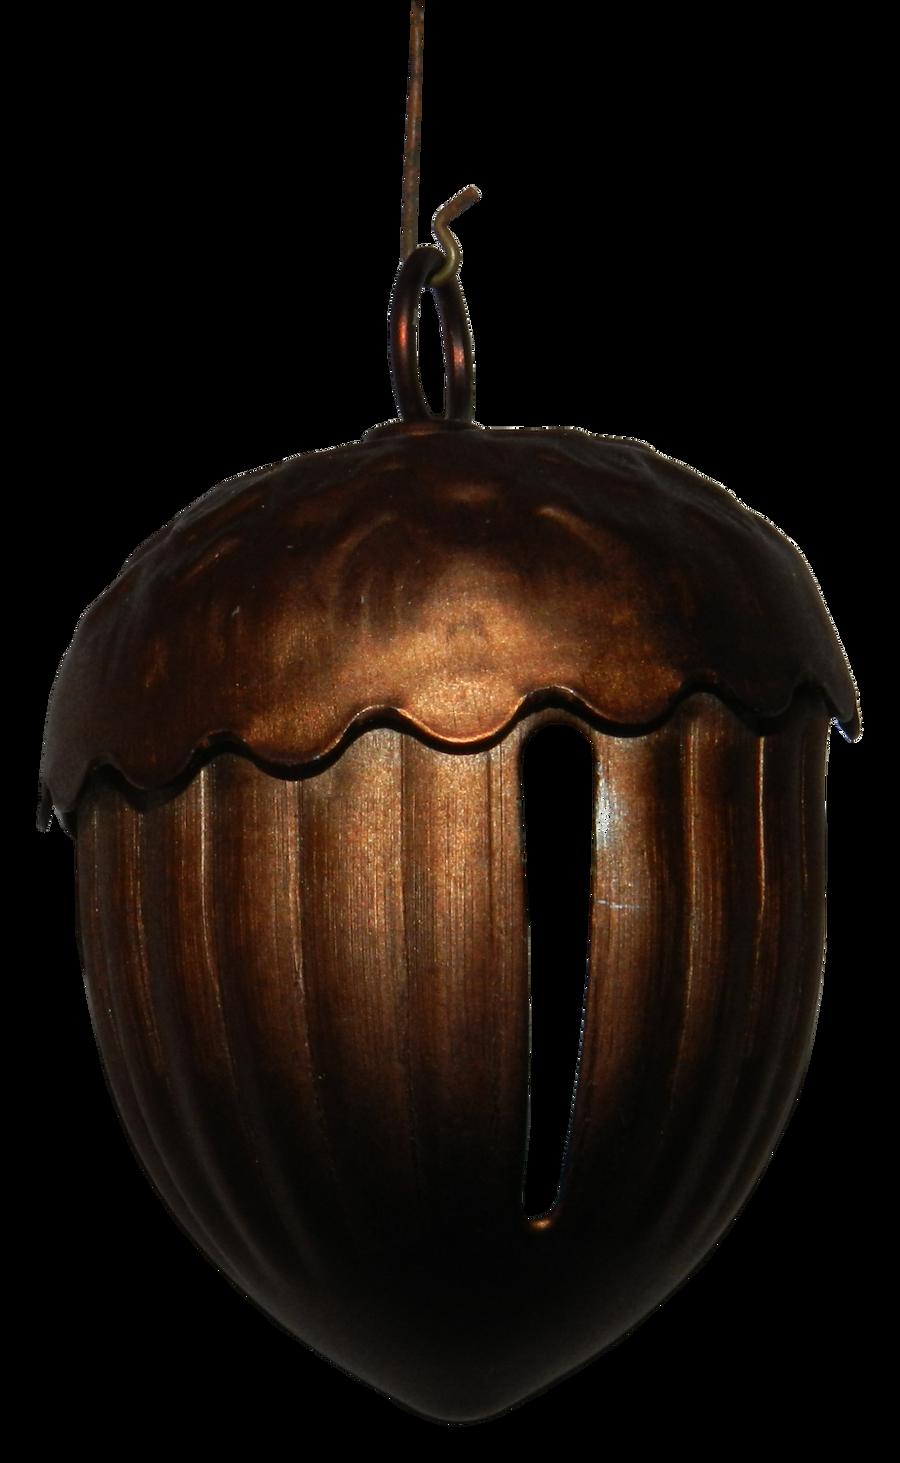 Acorn Christmas Bell Ornament by EveyD